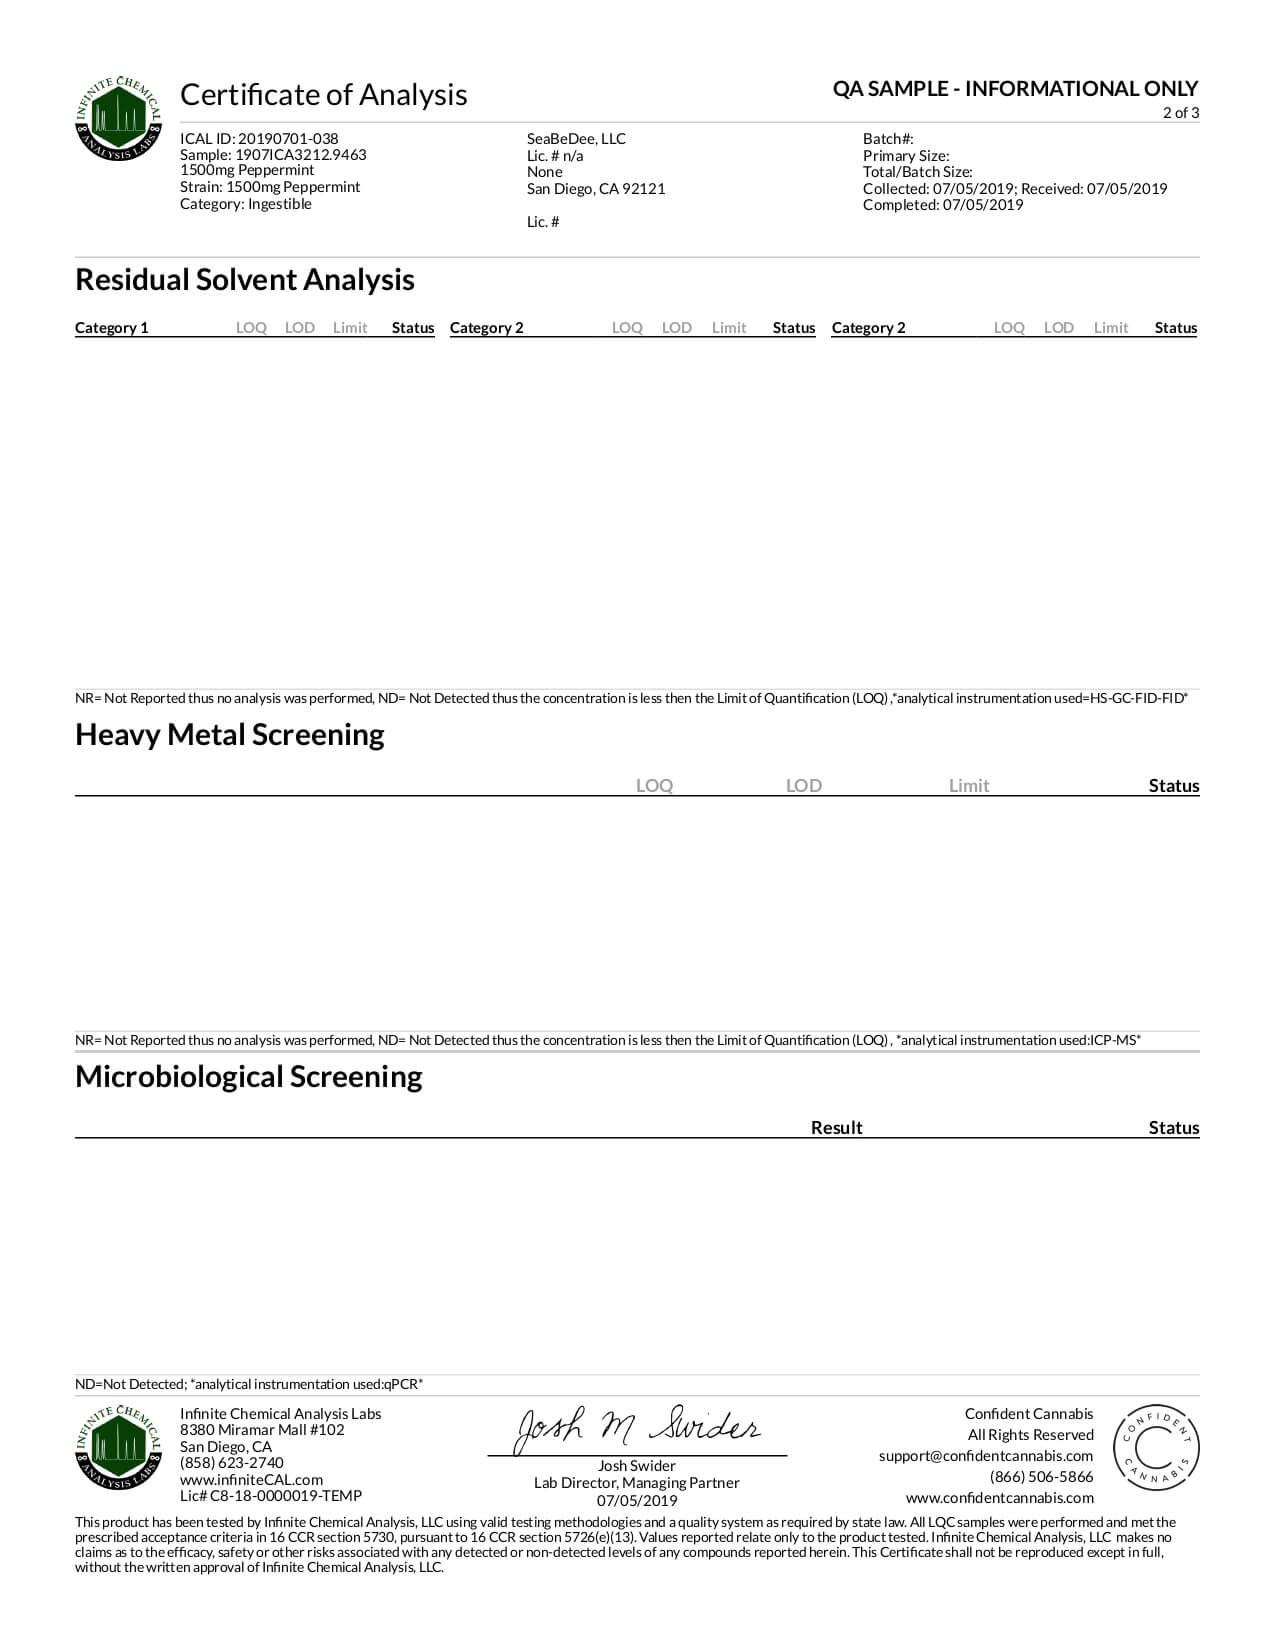 Seabedee CBD Tincture Full Spectrum Peppermint 1500mg Lab Report